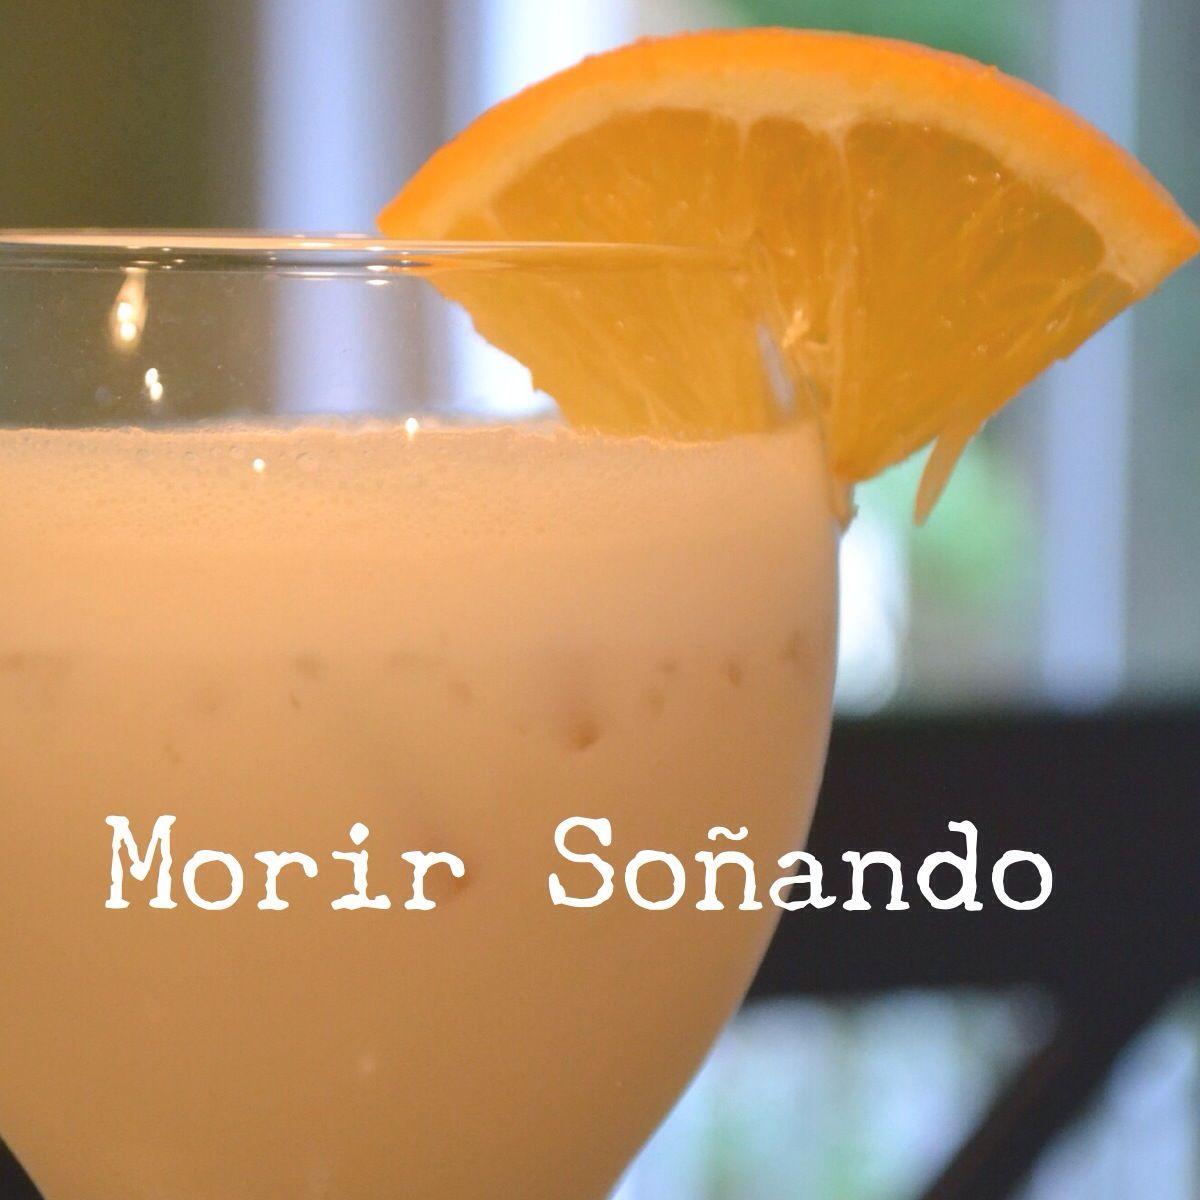 Morir Soñando (Die Dreaming virgin drink)  www.sundaycena.blogspot.com Serves about 5-6 / 1.5 cups of Orange Juice (or freshly squeezed Oranges), 2 cups of Milk (or evaporated milk), 1 cup of brown sugar, 1 teaspoon vanilla extract, 1 cup of ice - blend & enjoy